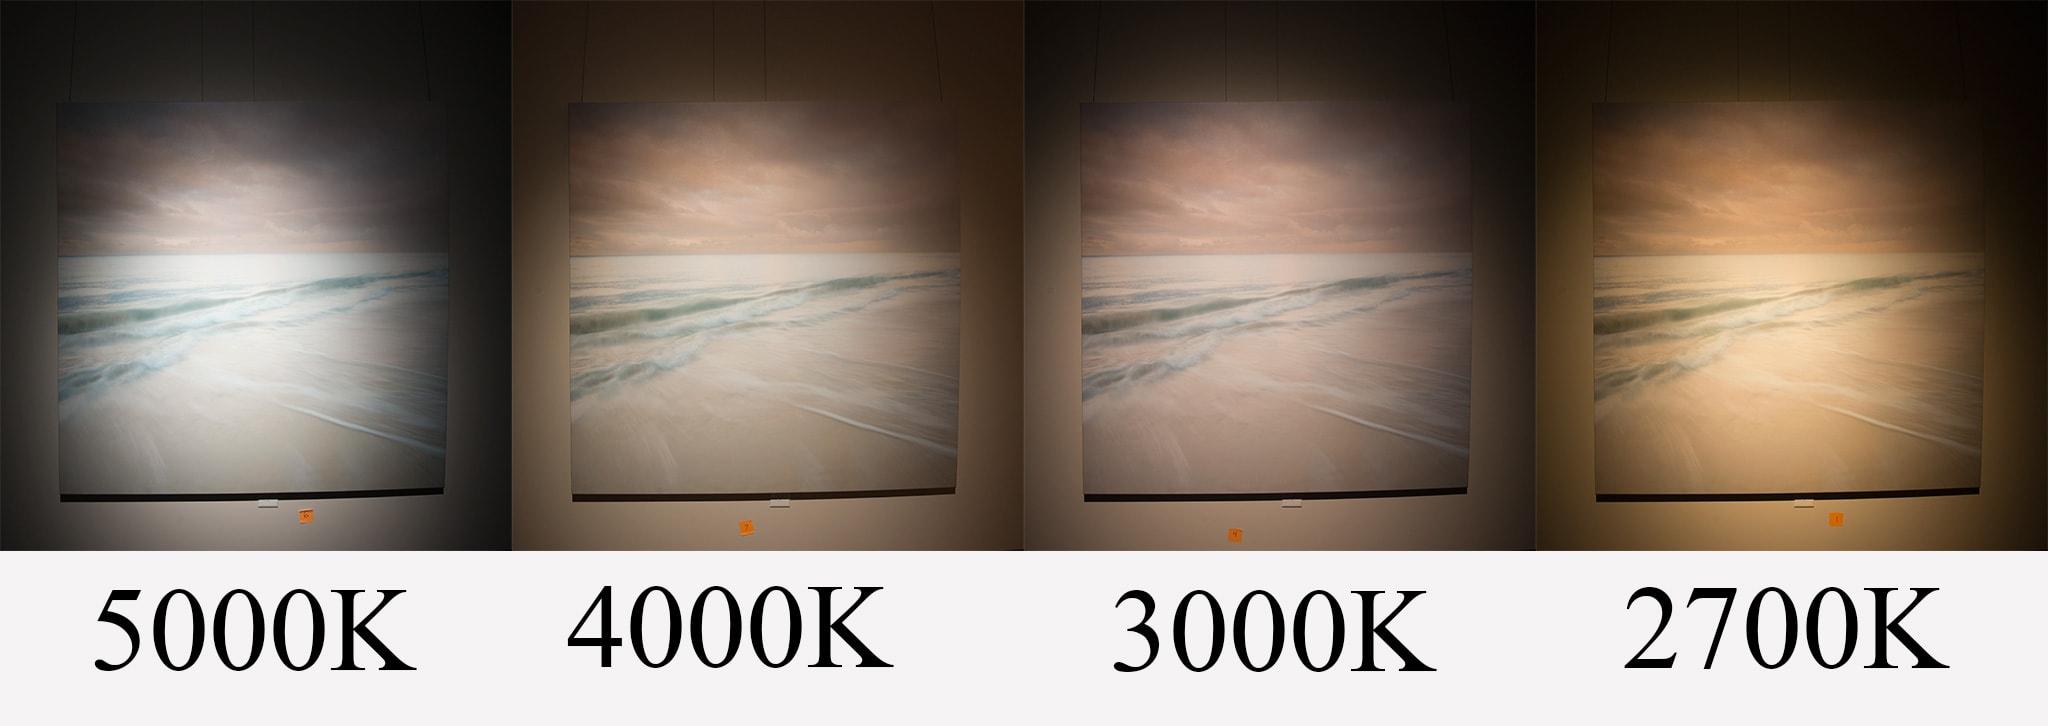 2700 Eller 3000k